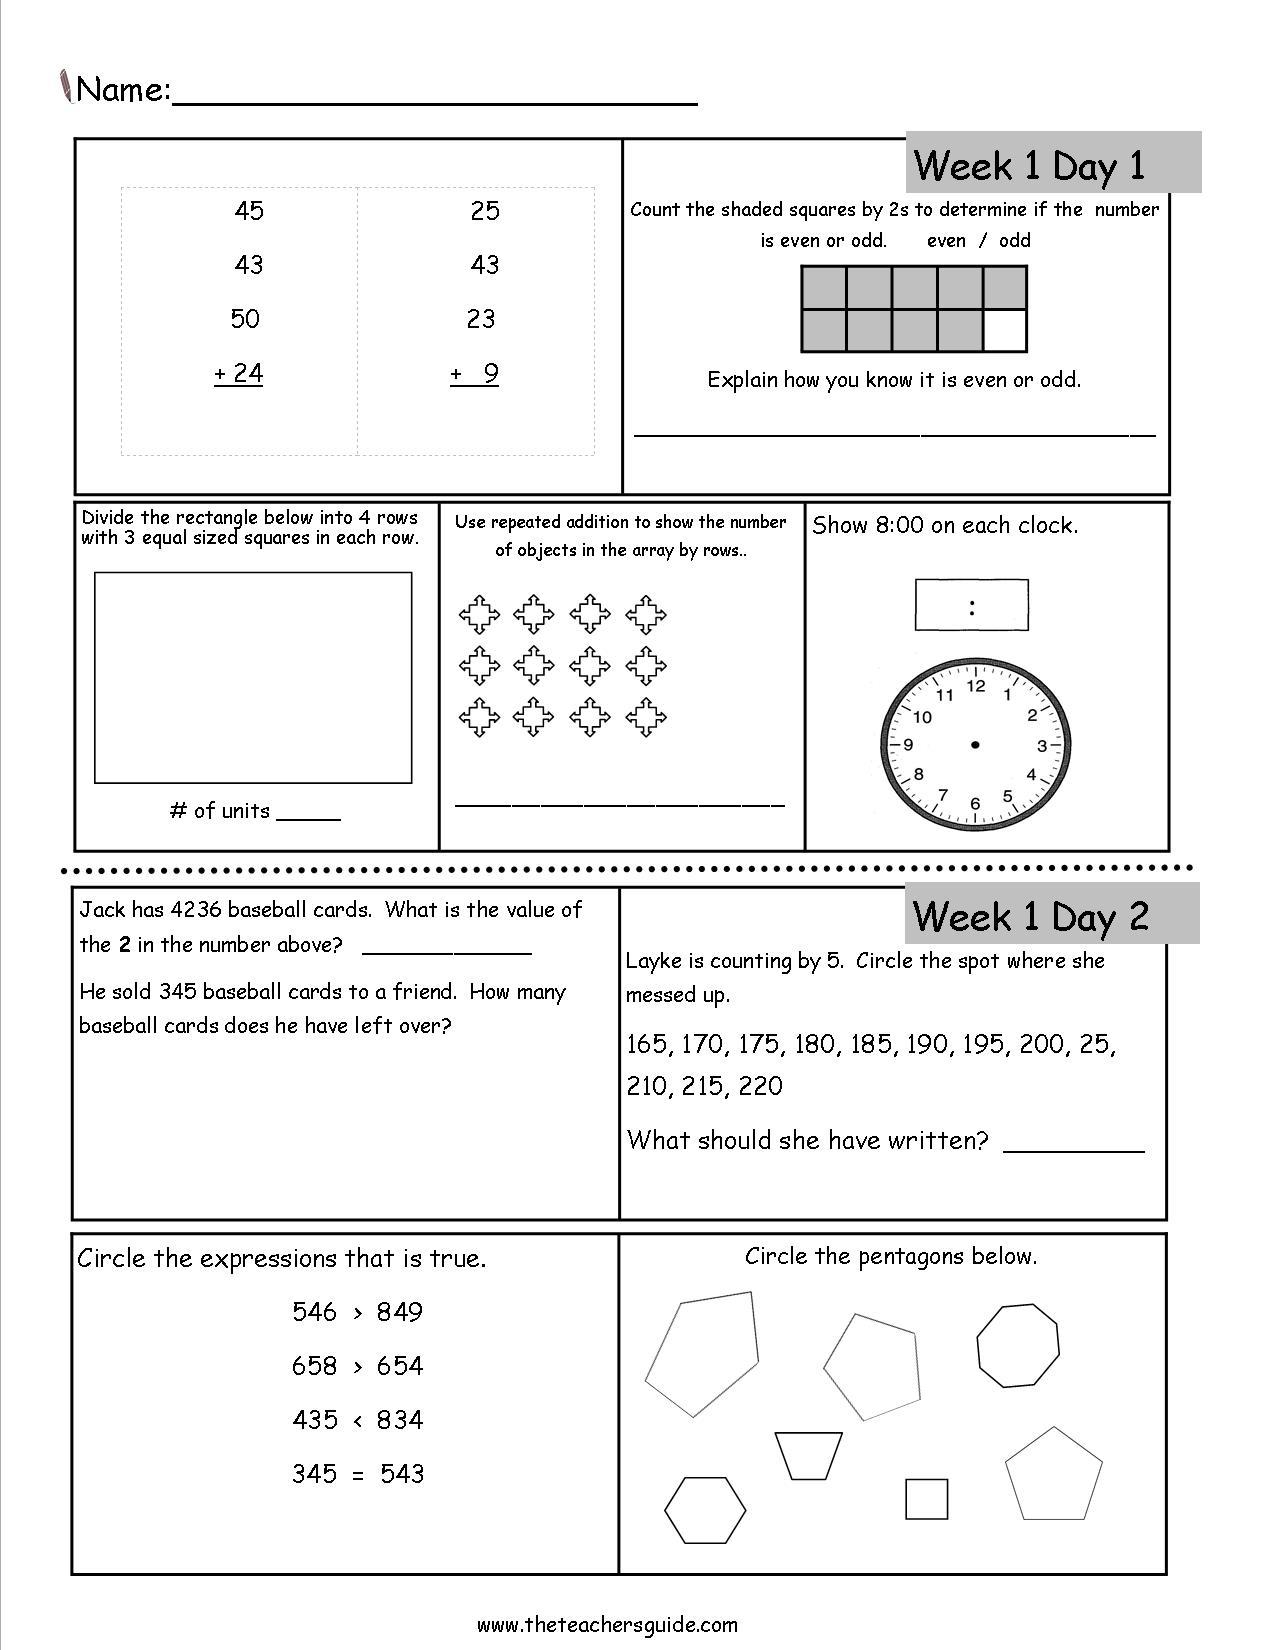 Free 3Rd Grade Daily Math Worksheets - Free Printable 4Th Grade Morning Work